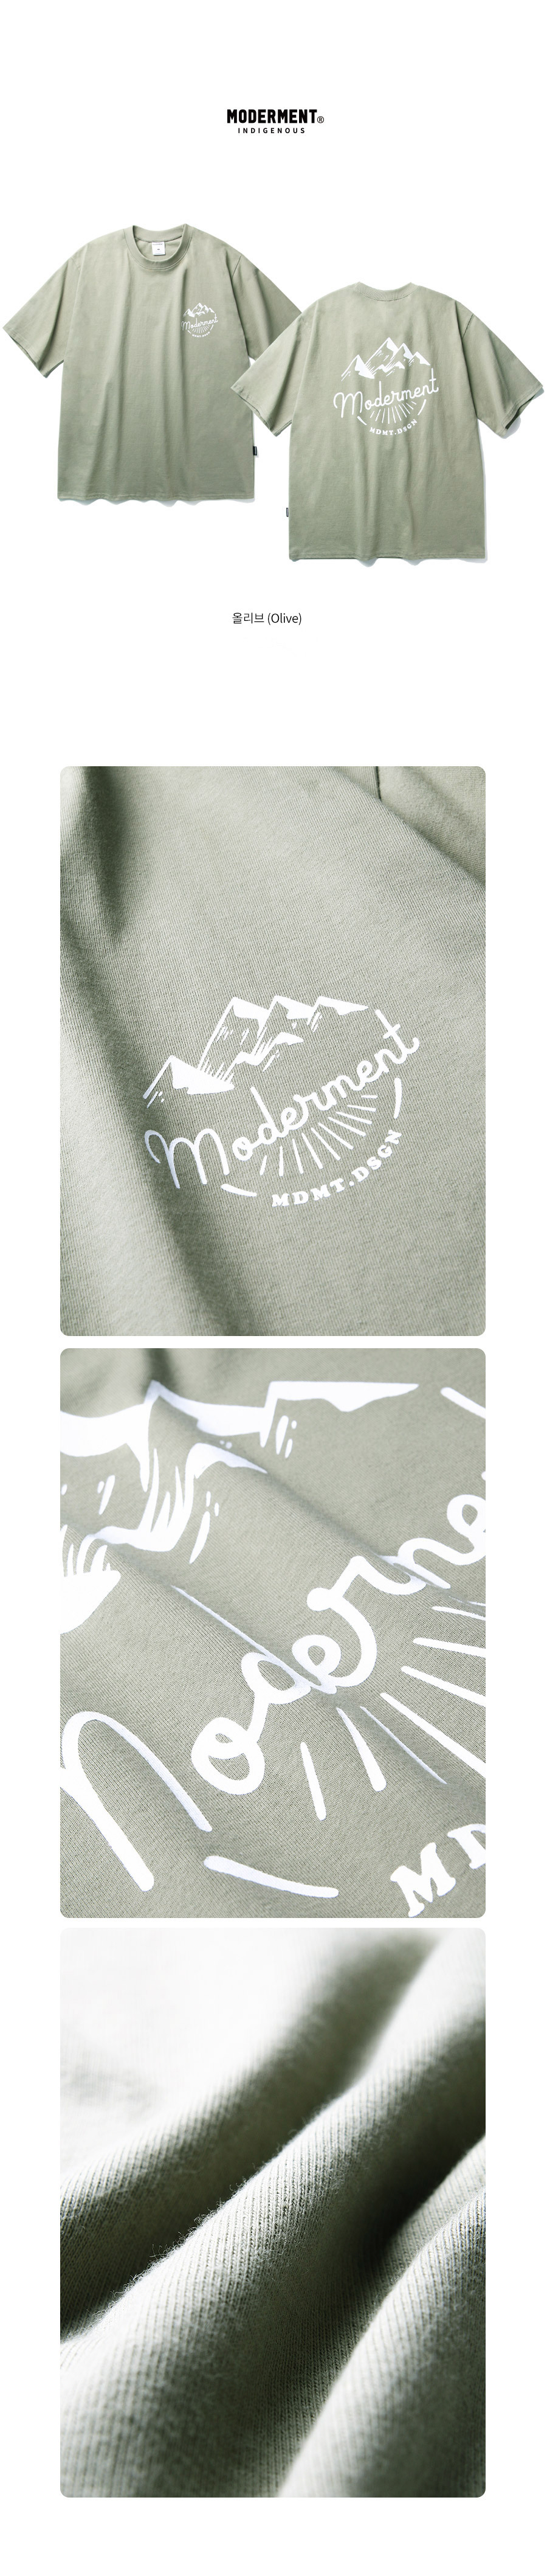 [UNISEX] 마운틴 오버핏 반팔 티셔츠 (올리브)